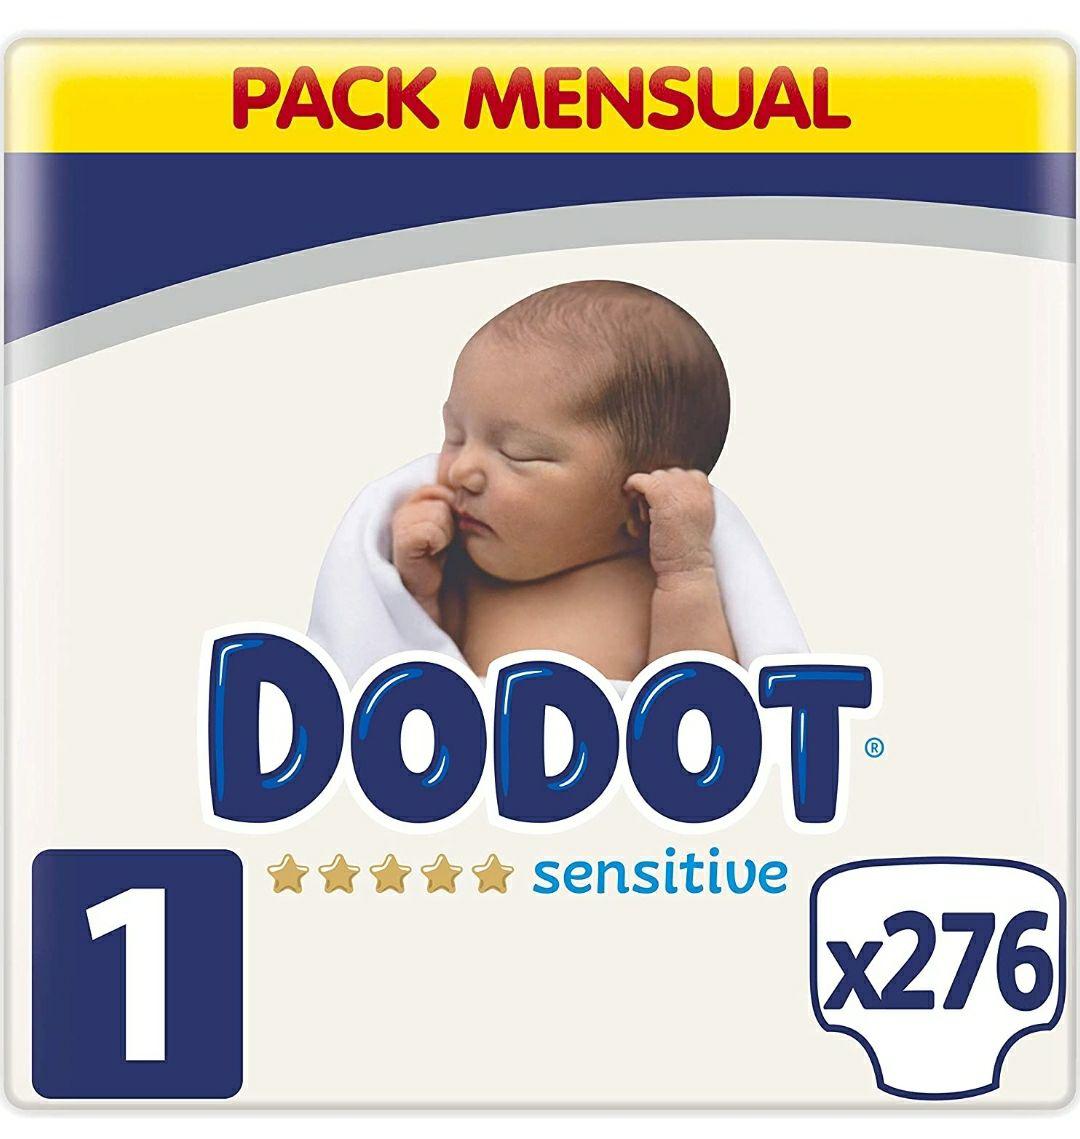 Pañales talla 1 Dodot a 14cents+ pack de Dodot gratis en la app Dodot VIP